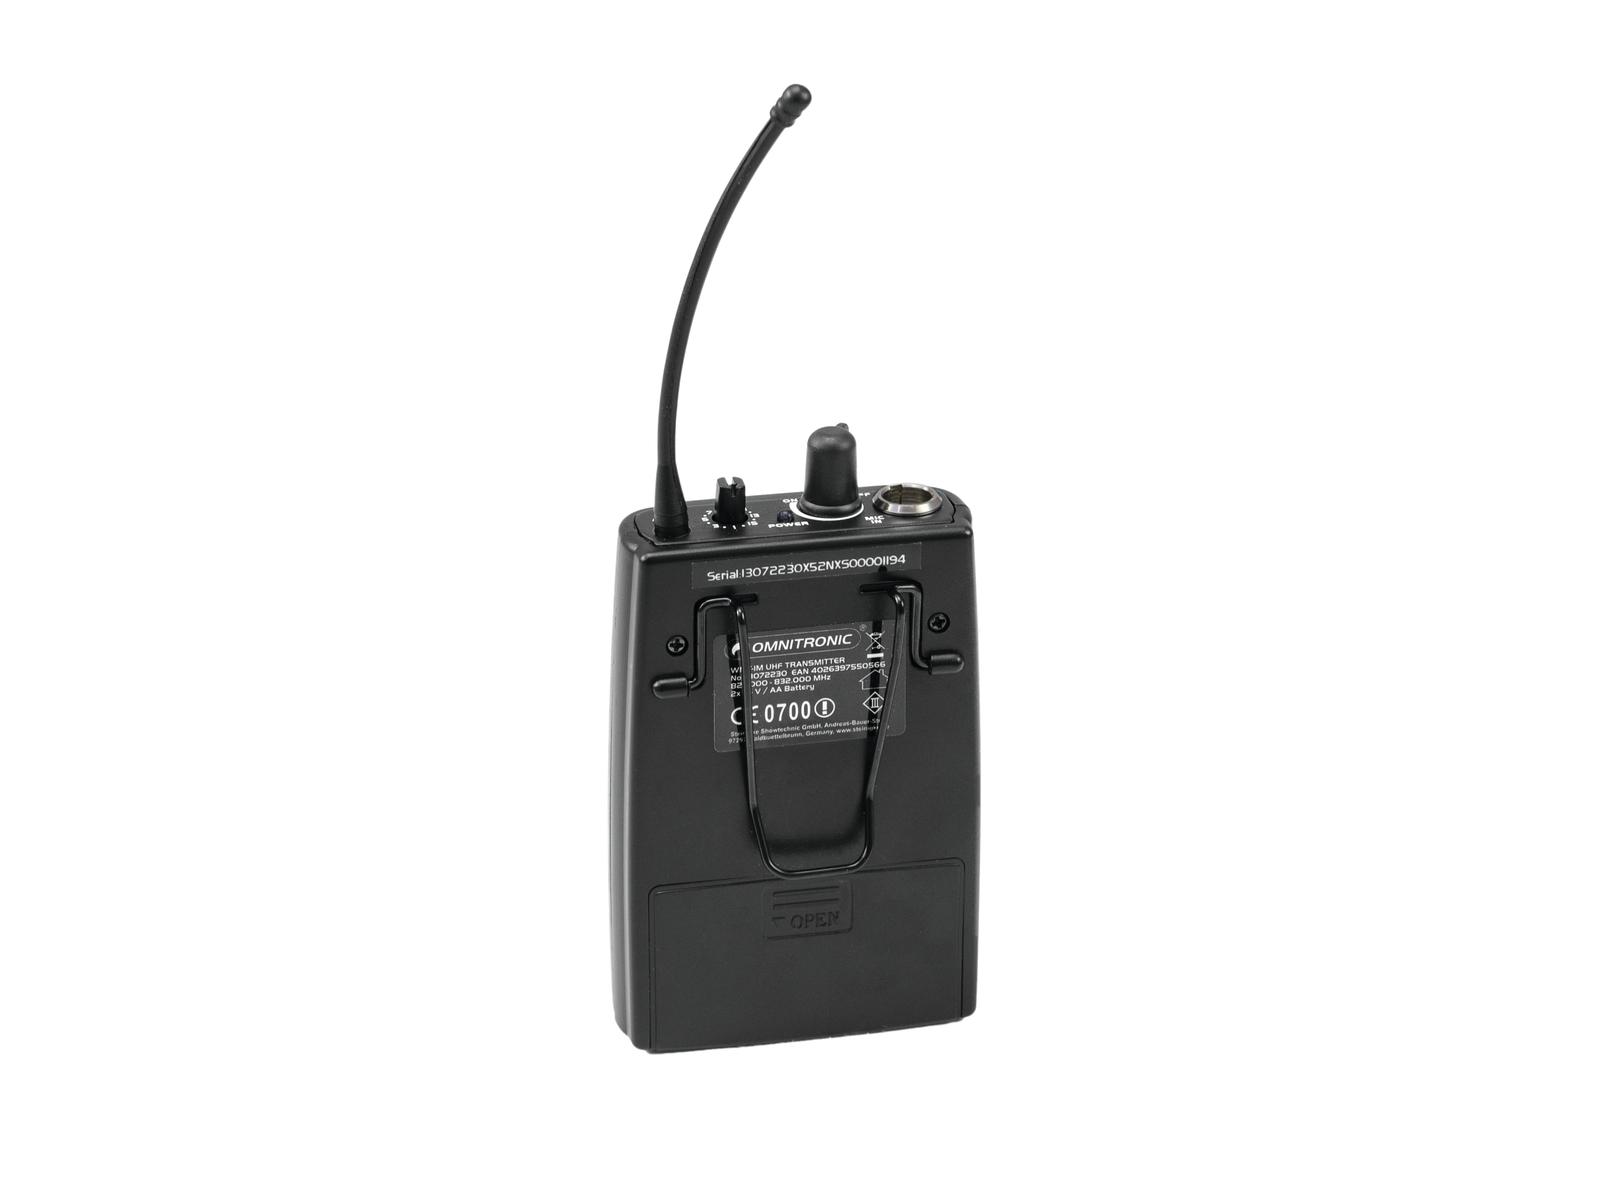 OMNITRONIC WMT-1M UHF-Sender, mono